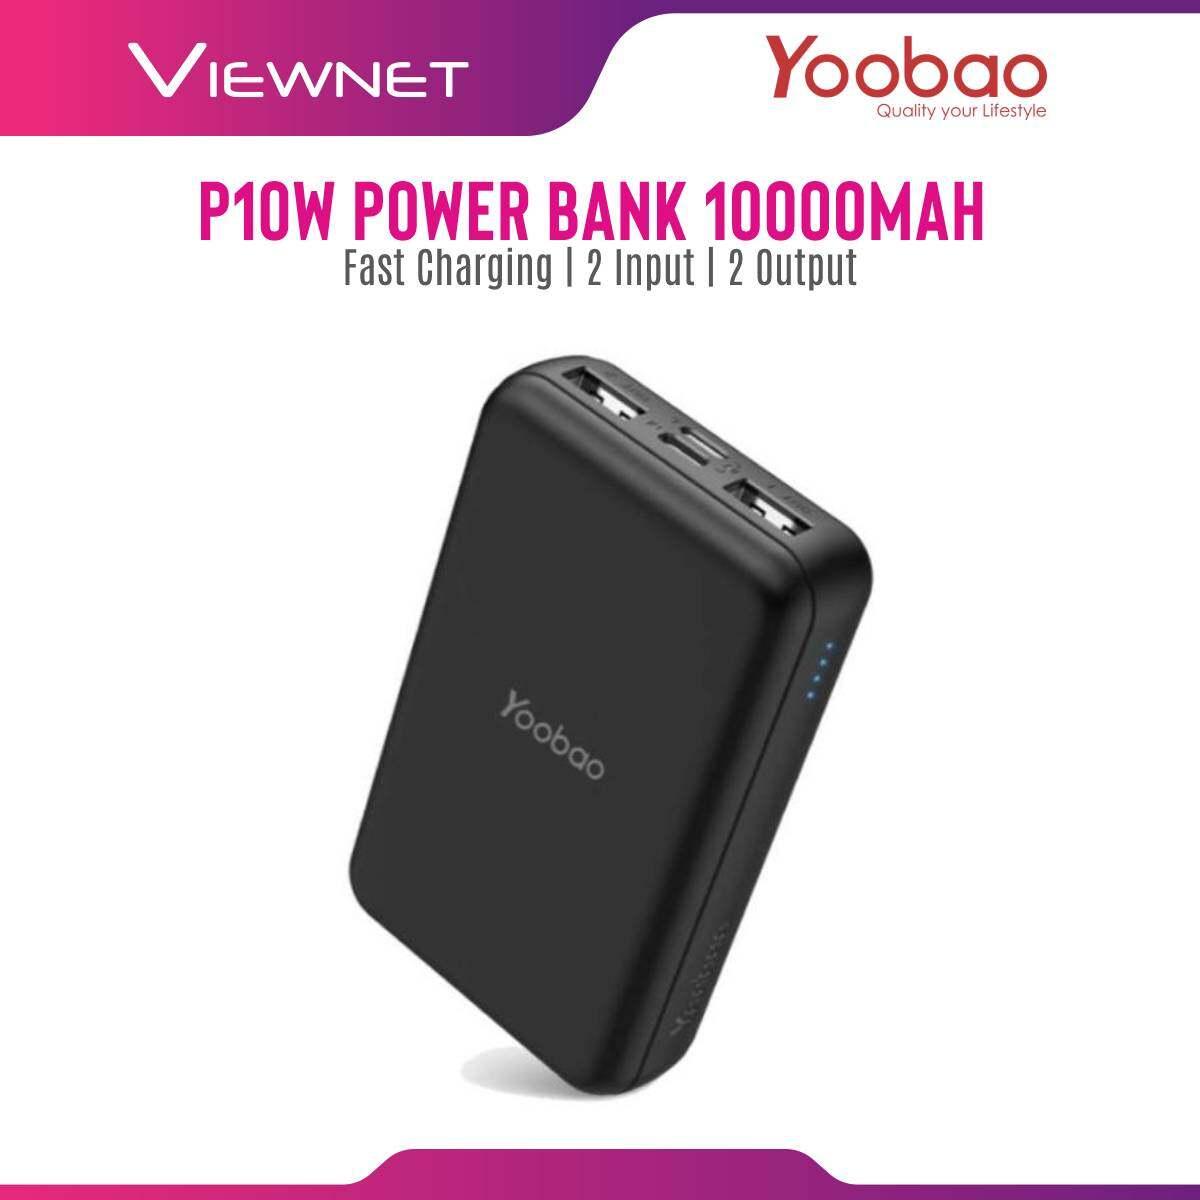 Yoobao P10W PowerWizard 10000mAh Ultra Compact Mini Portable Cute Animal Design Fast Charge Power Bank With Micro Lightning Input Dual USB Output